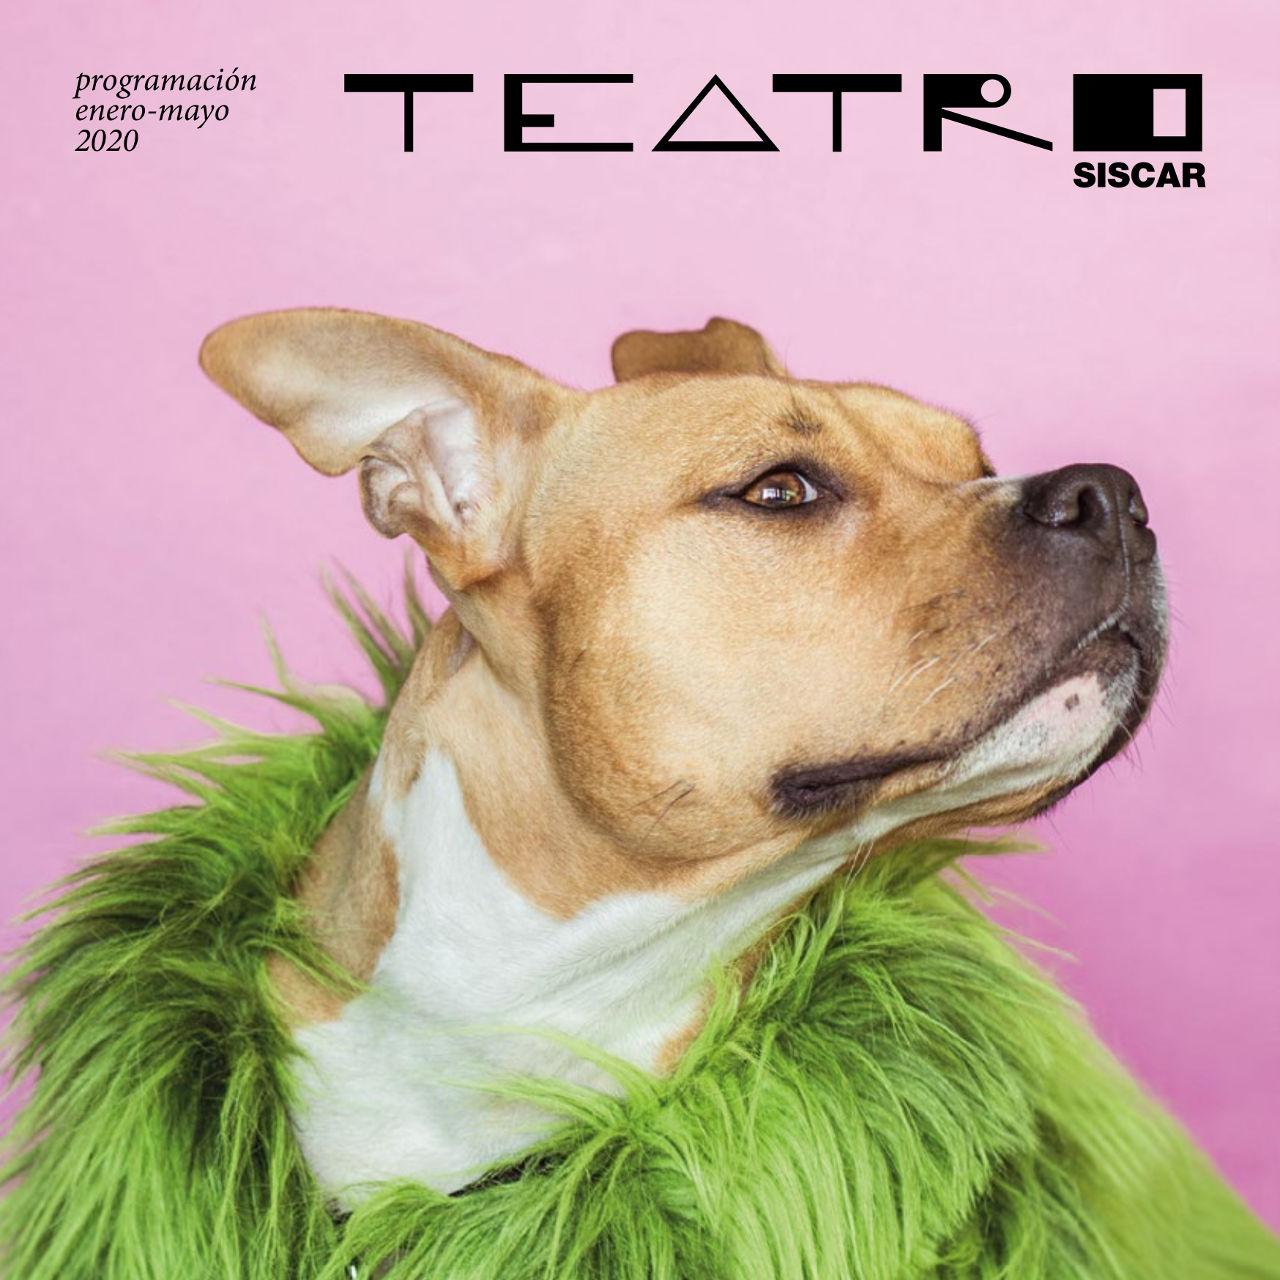 2020_01-06_Folleto programacion 1er trimestre Teatro Siscar_portada web